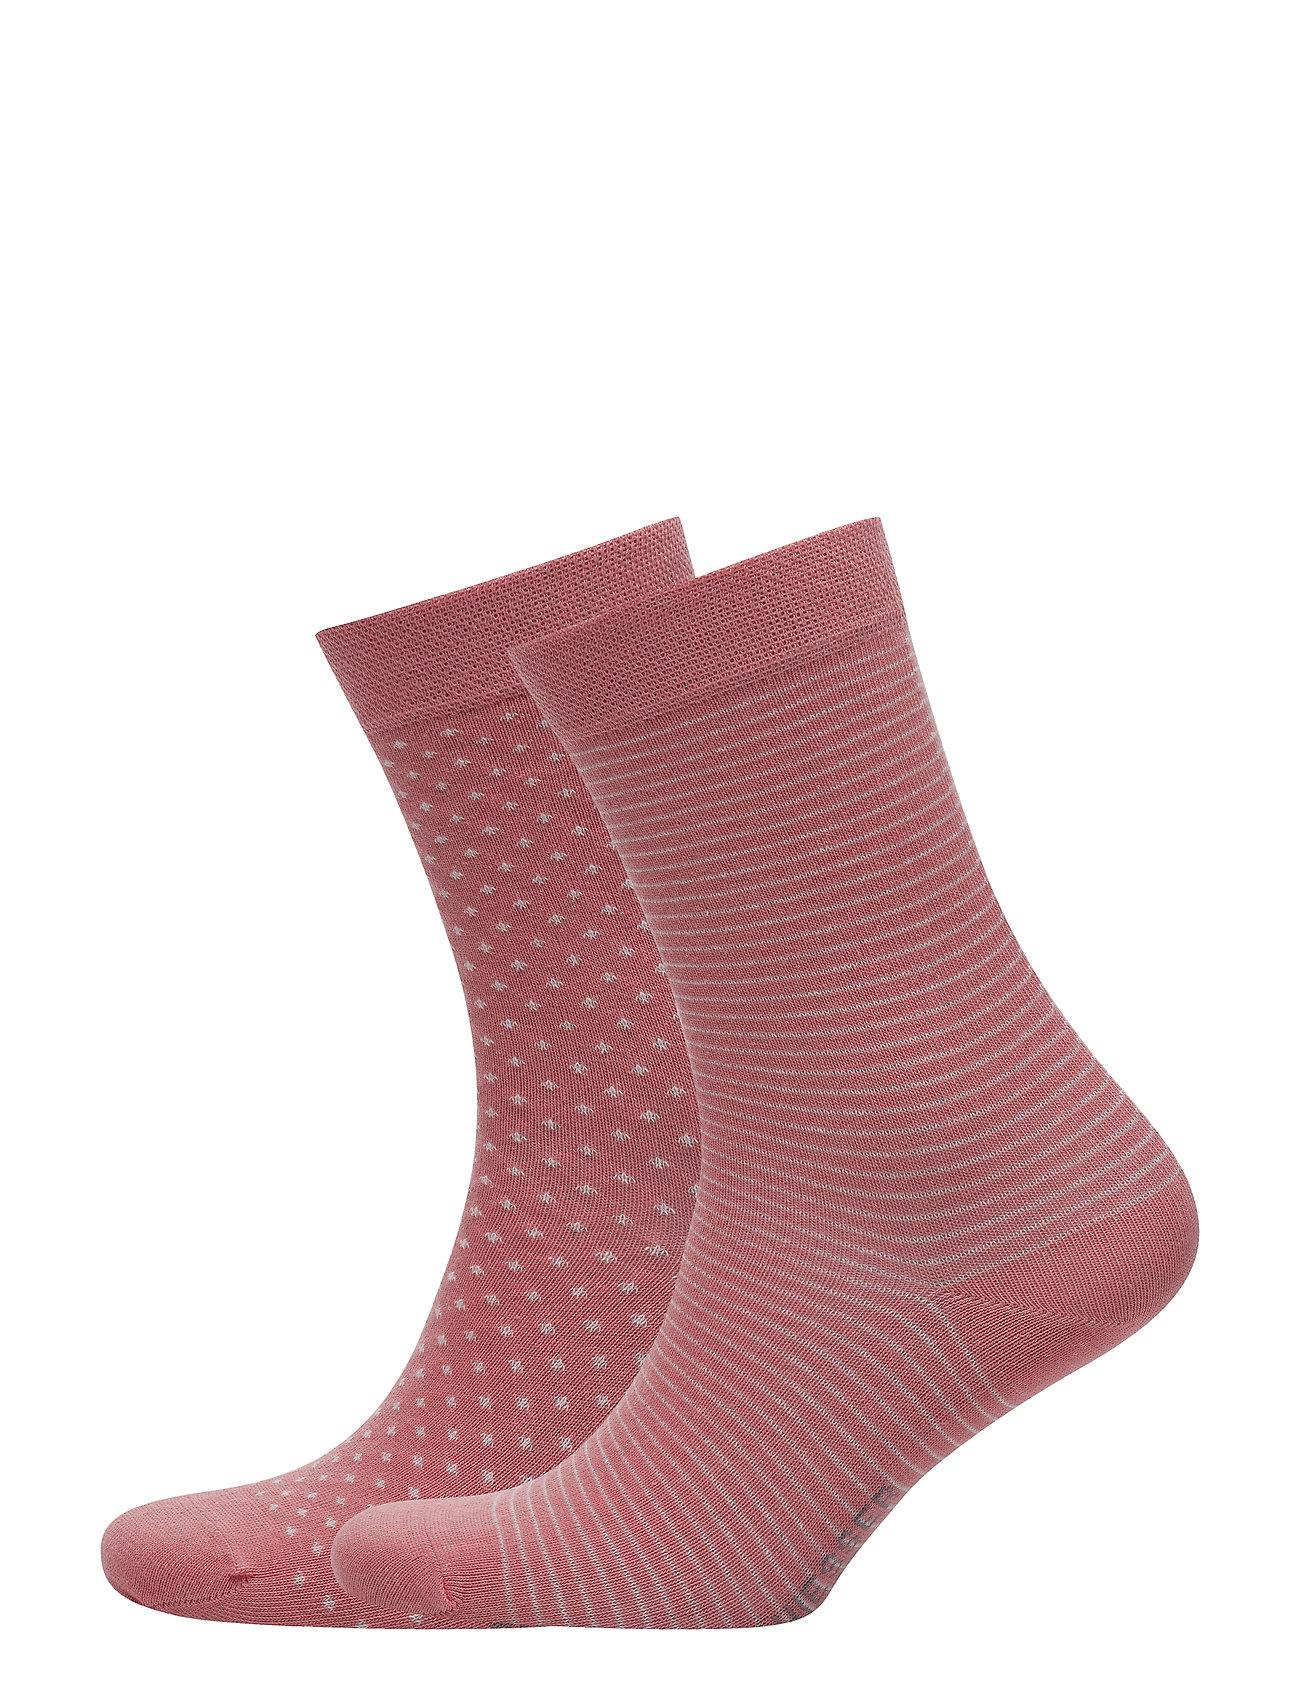 Schiesser Socks - CORAL RED